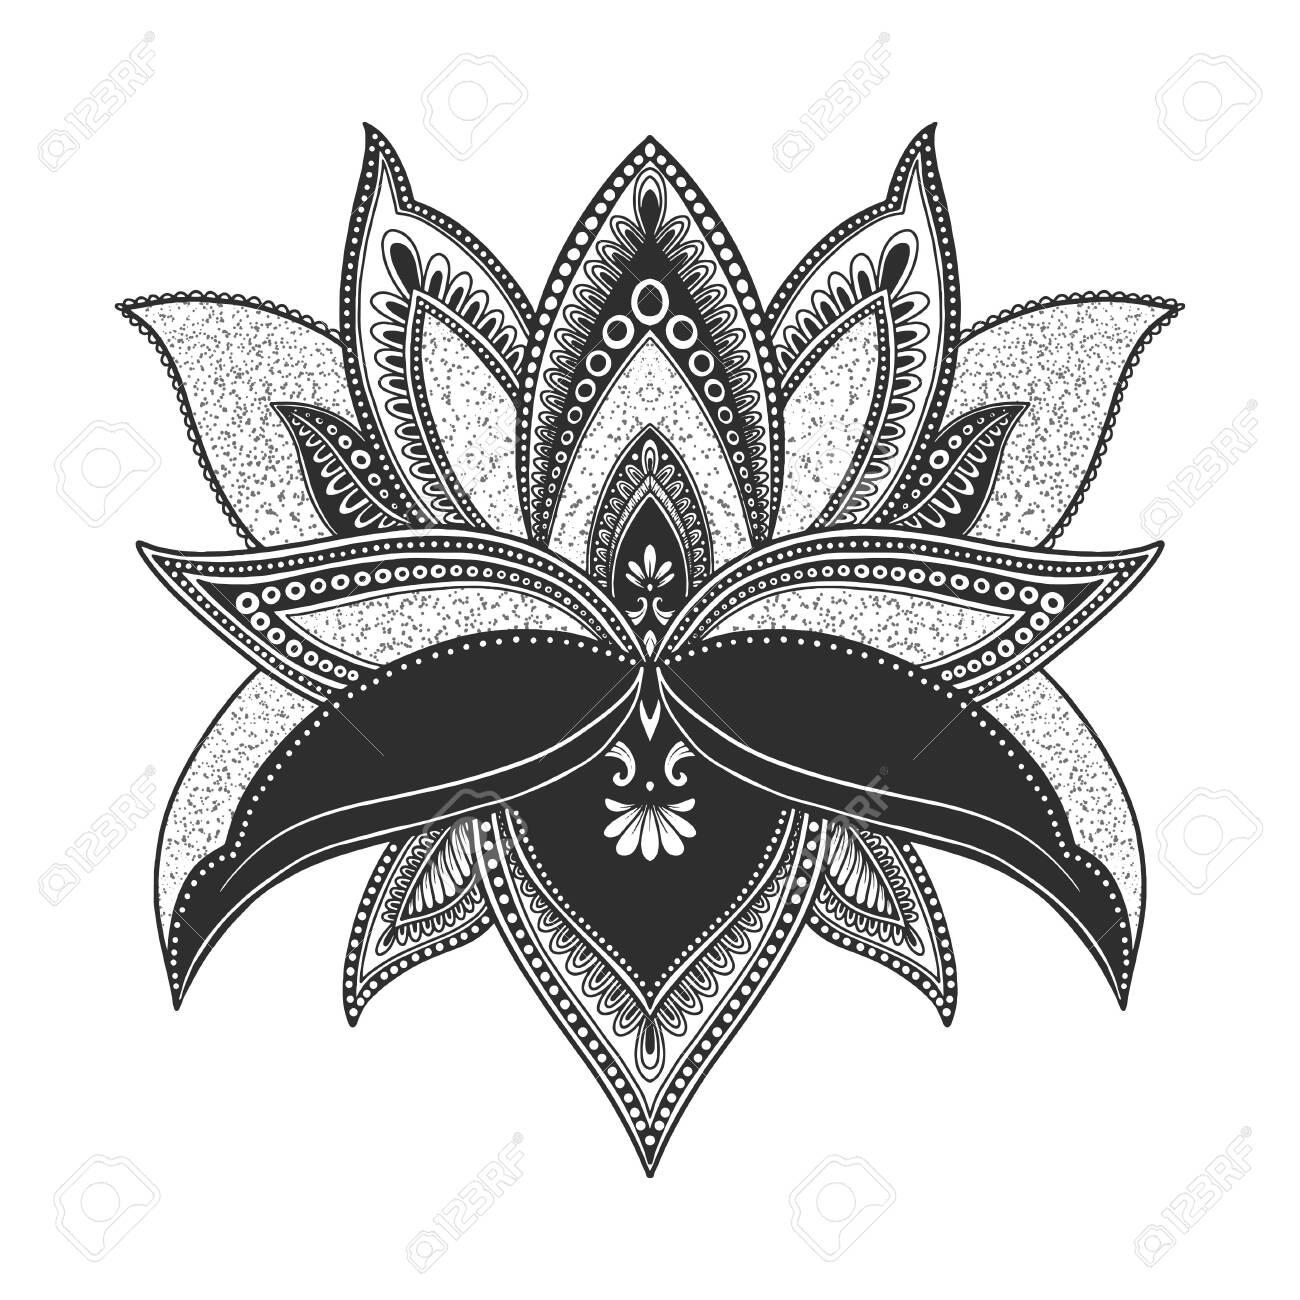 Filigree lotus flower, black vector, hand drawn - 132919765